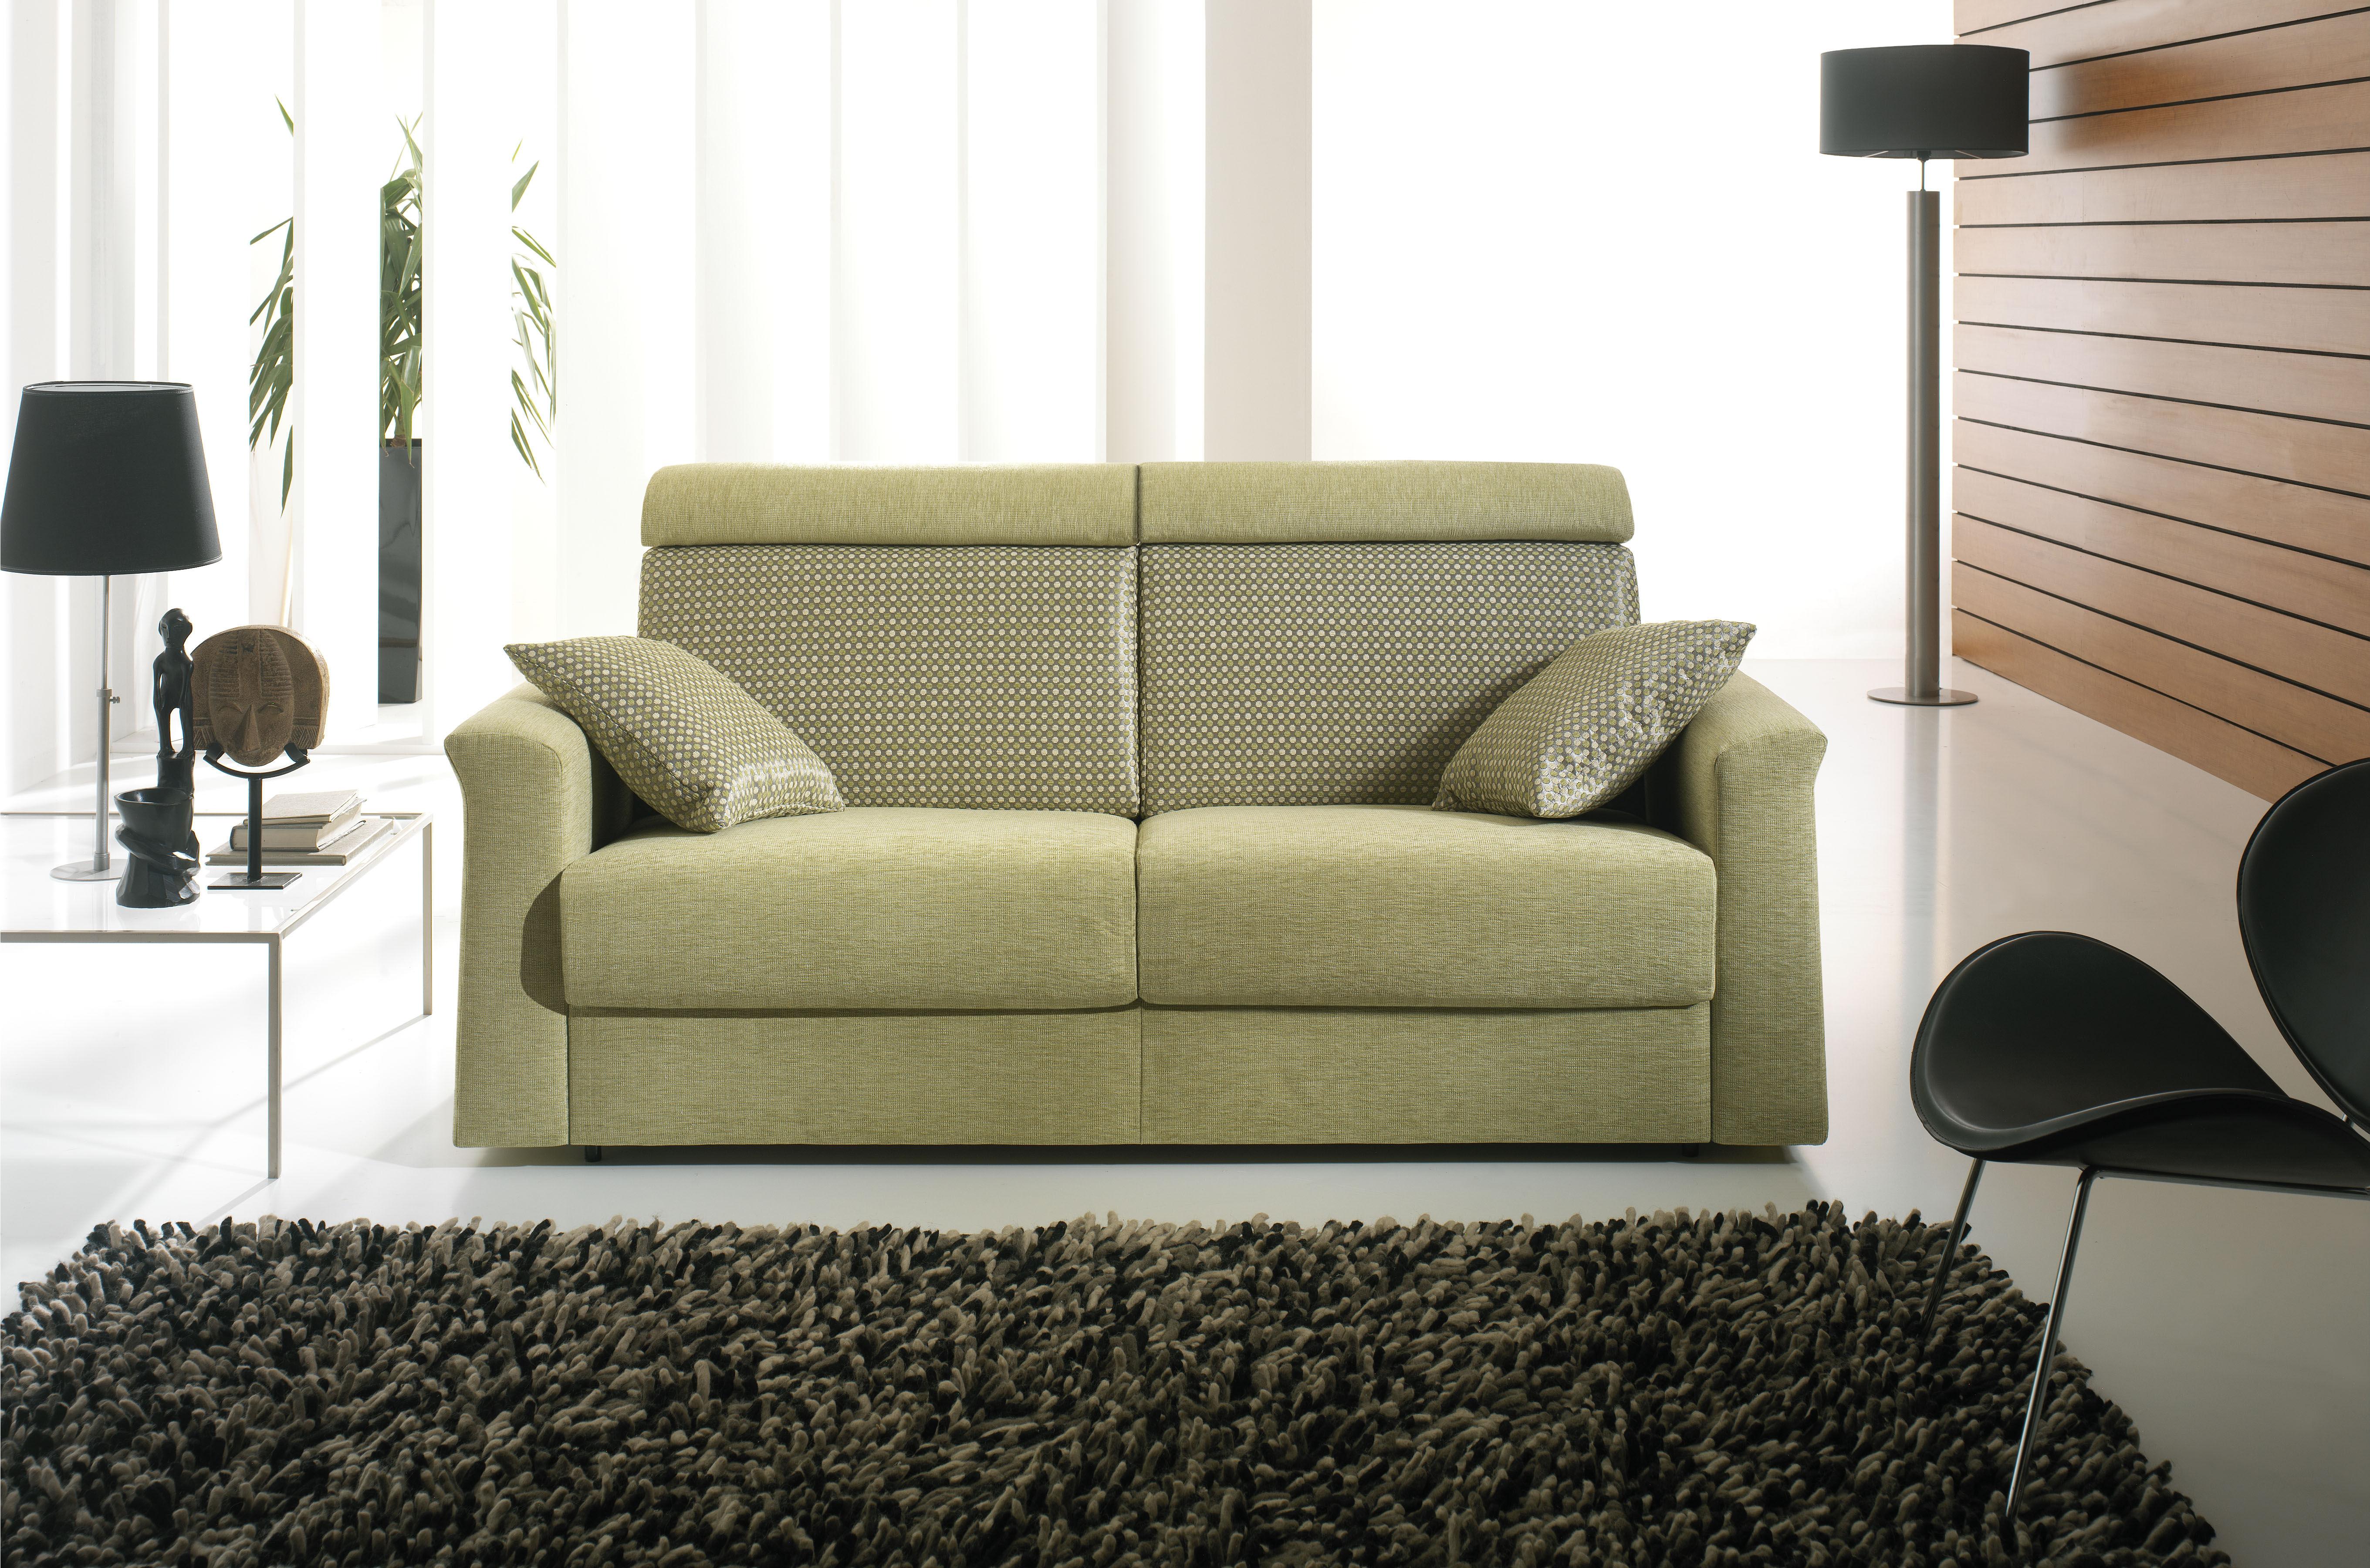 Sofas cama cat logo de muebles y calma de juan aguilar for Sofa cama catalogo